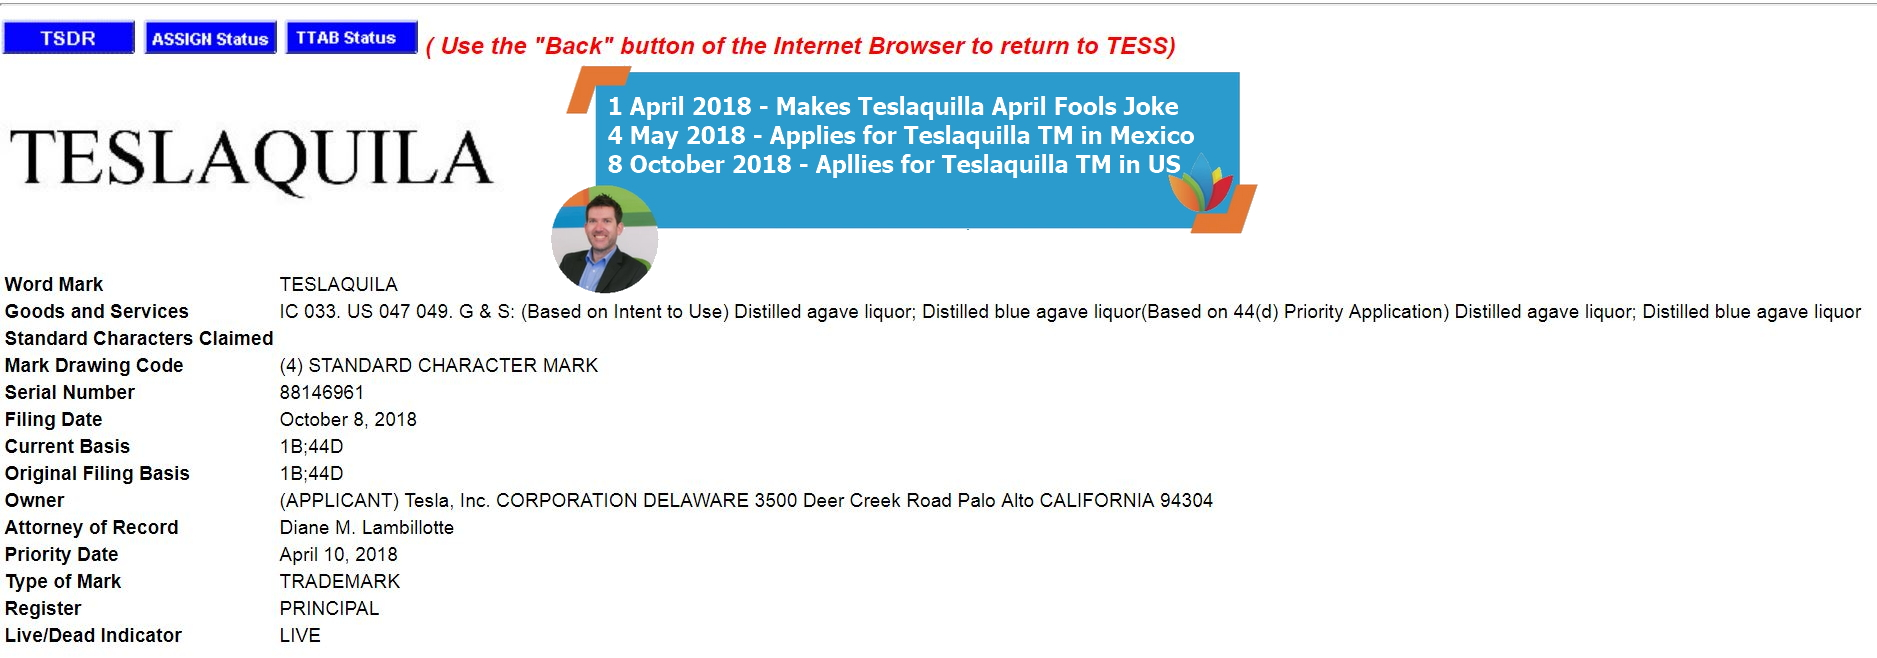 Teslaquila Trademark Application